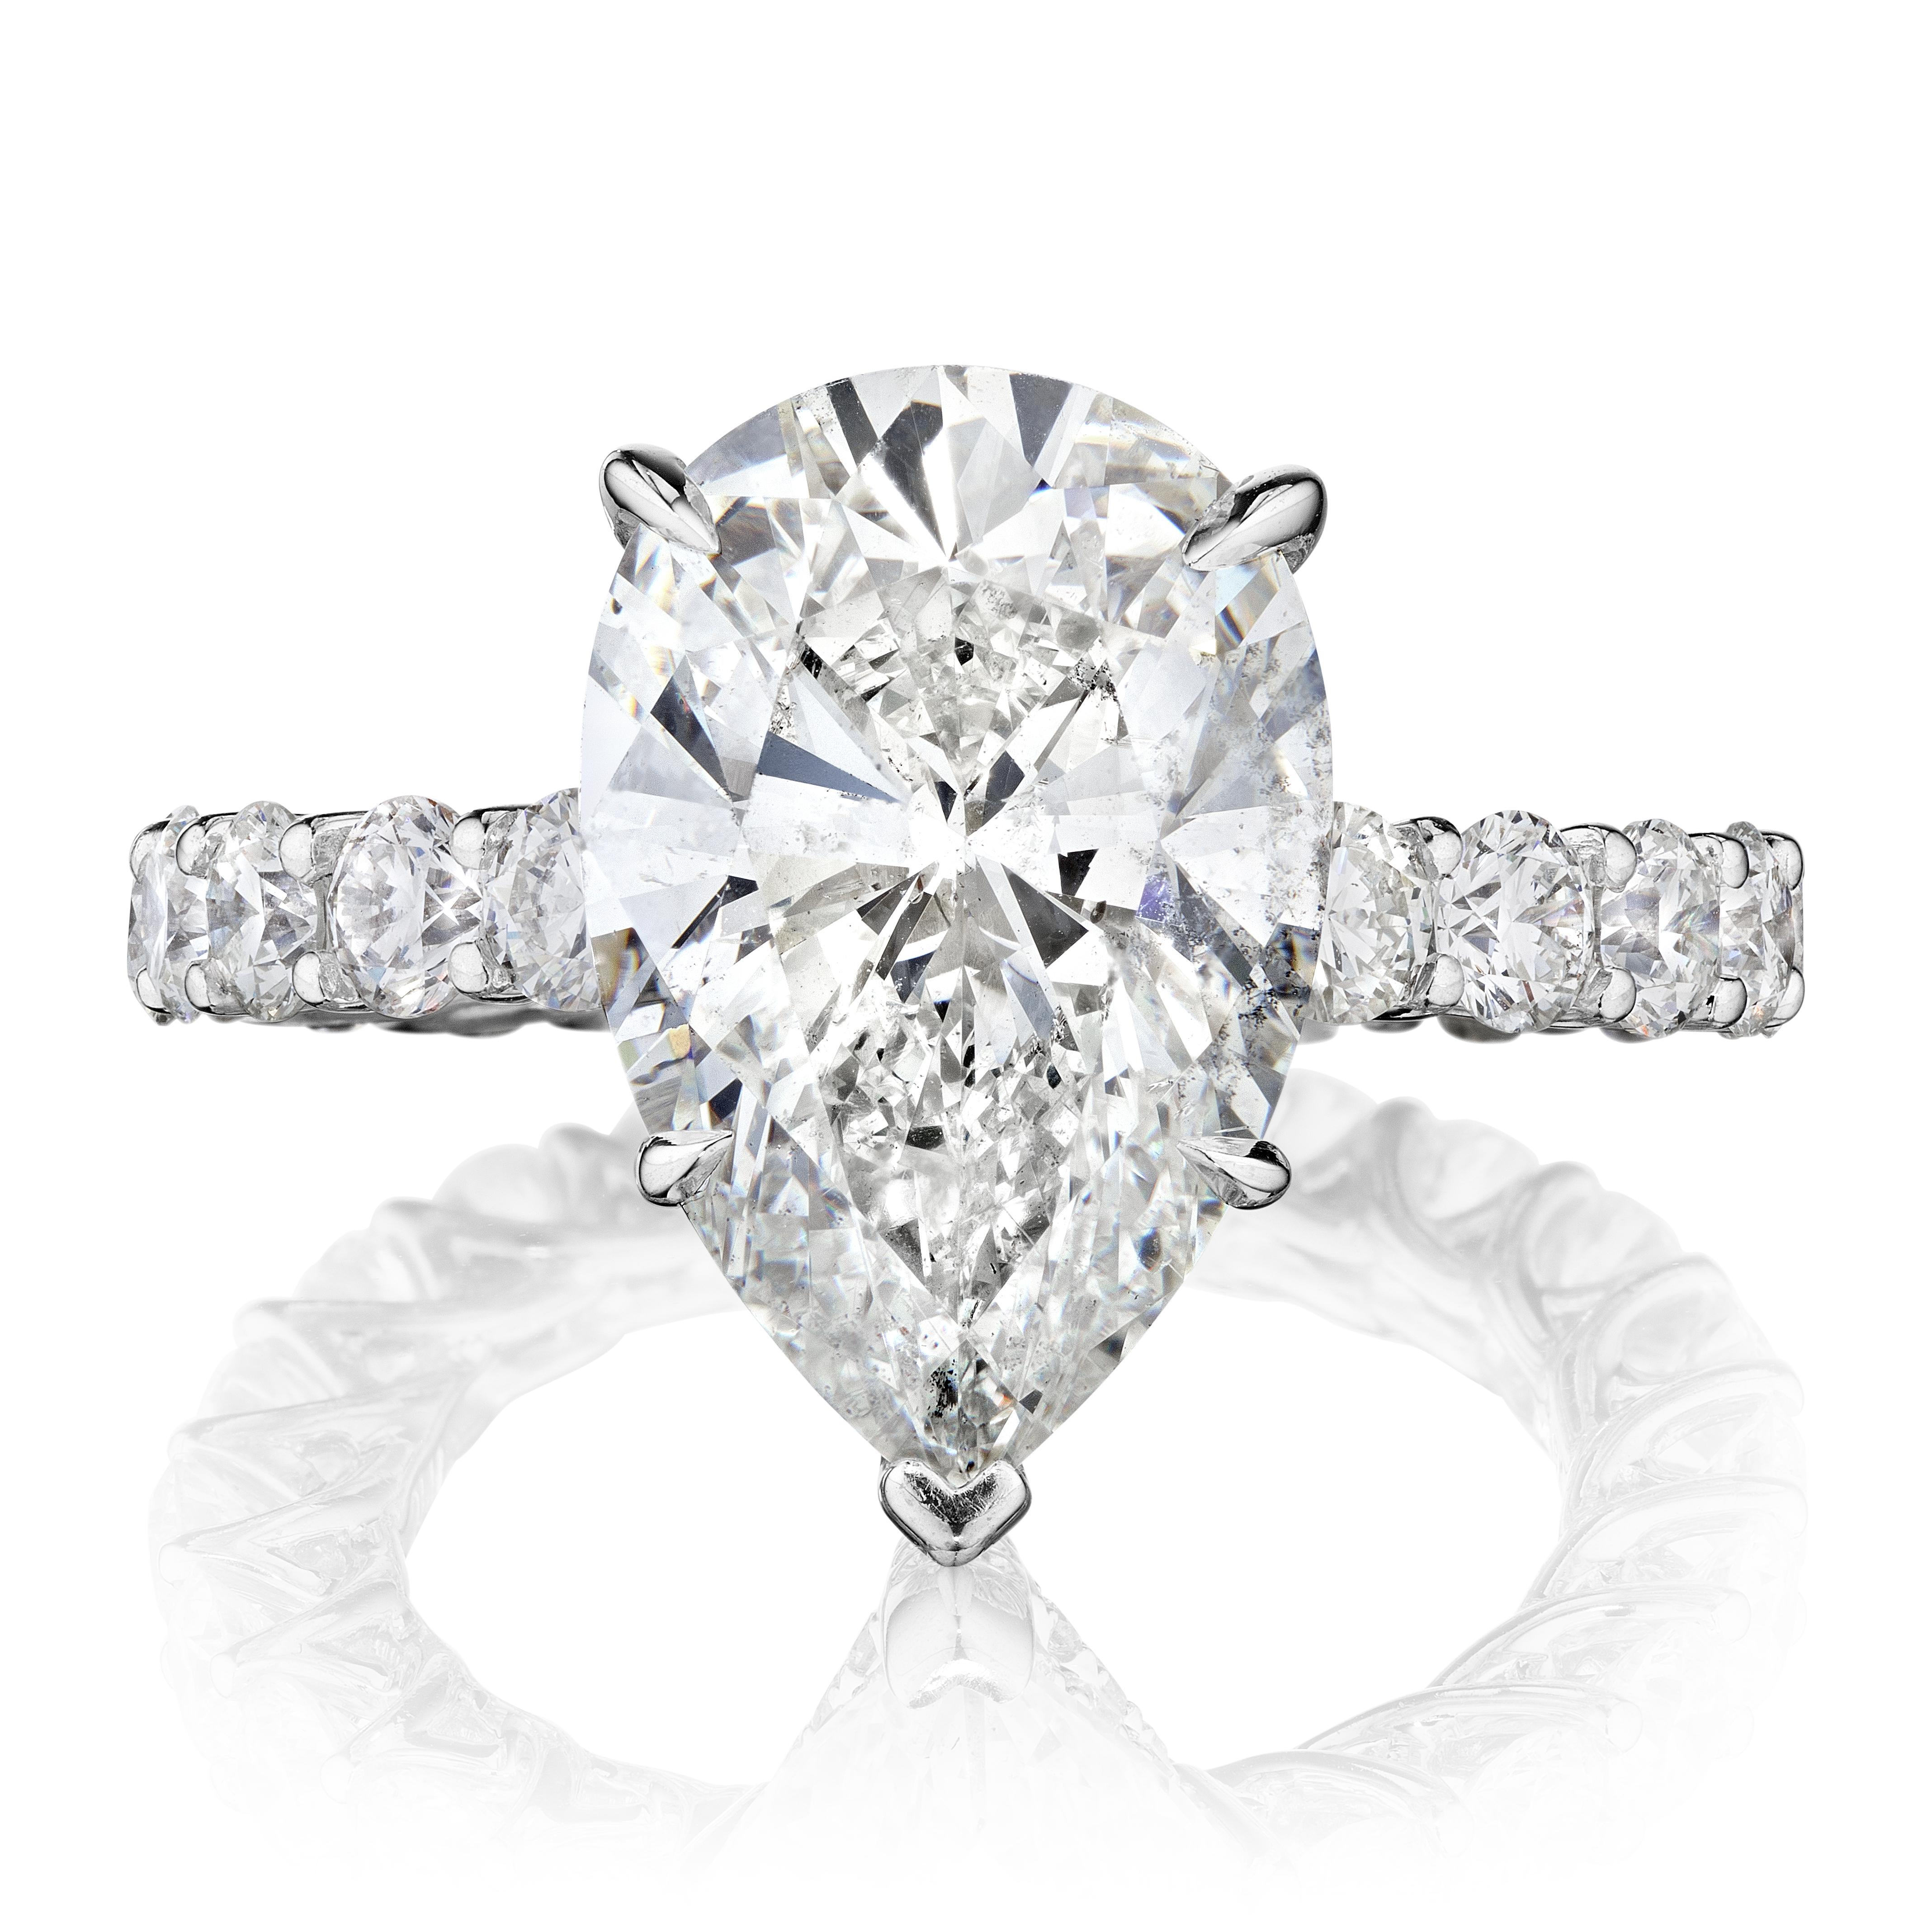 Skylar Forever Diamonds New York, NY